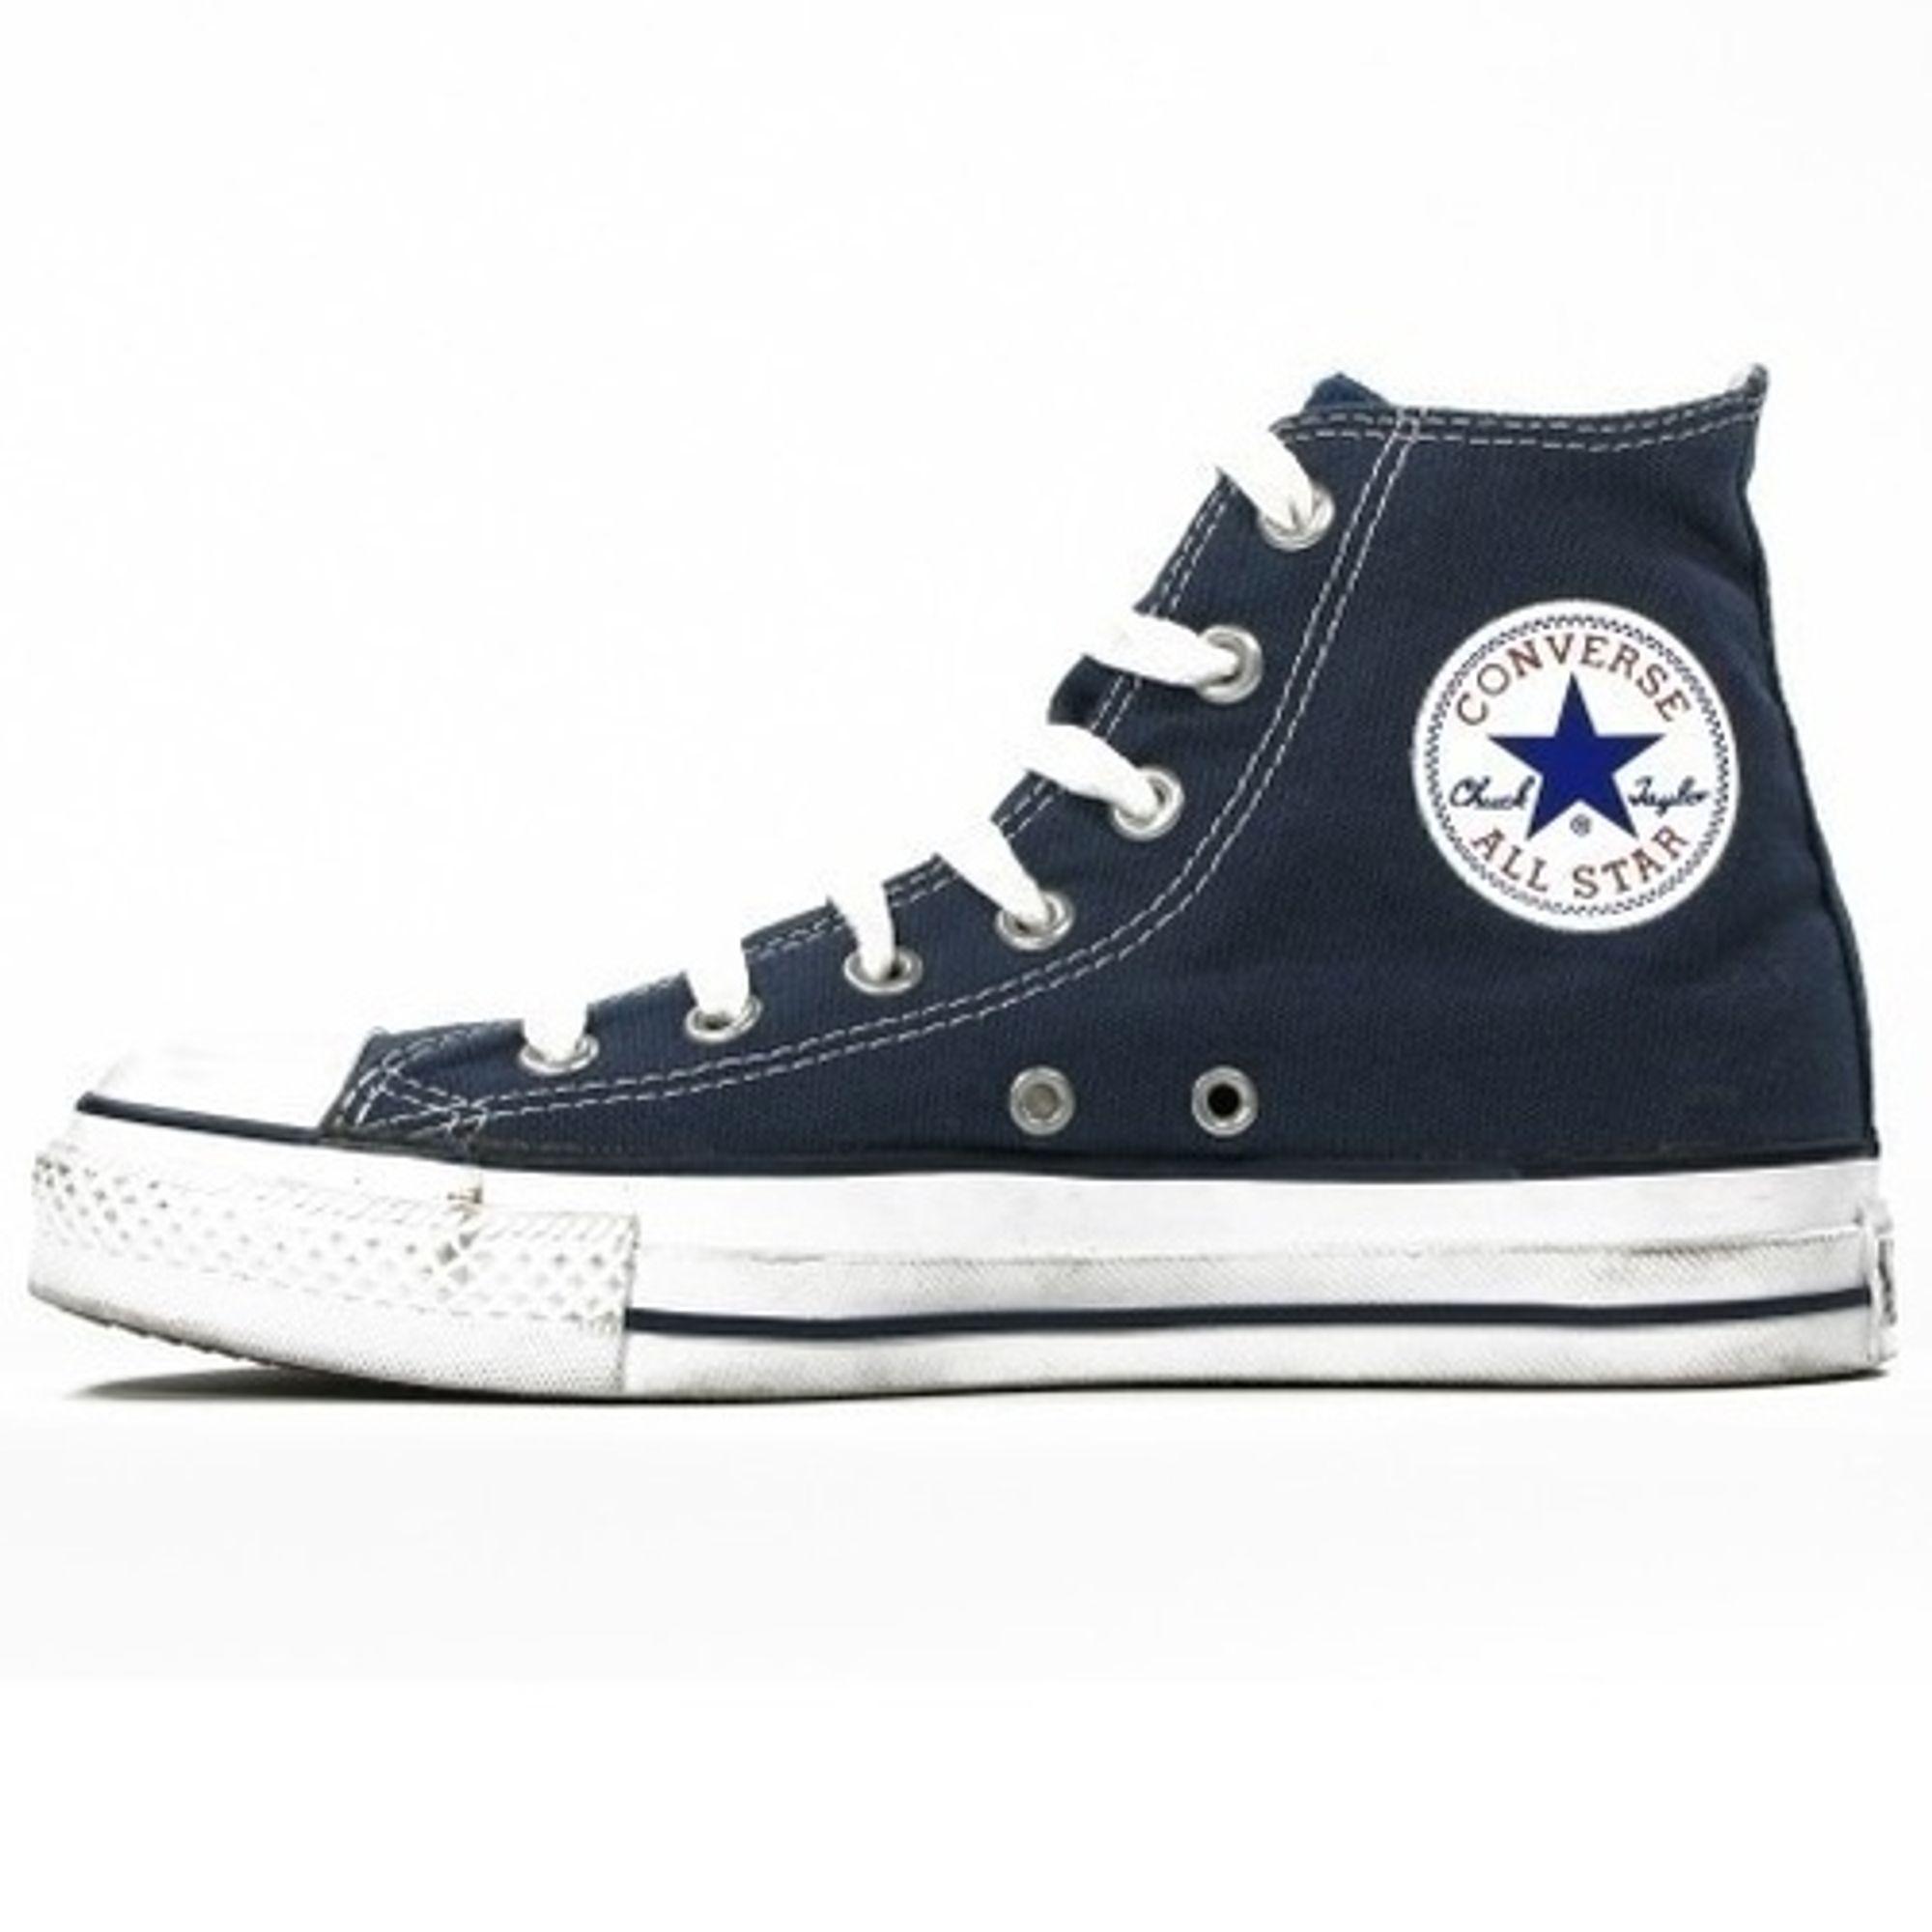 Converse Damen Schuhe All Star Hi Blau M9622C Sneakers Chucks Gr. 38 | starlabels outdoor lifestyle leder